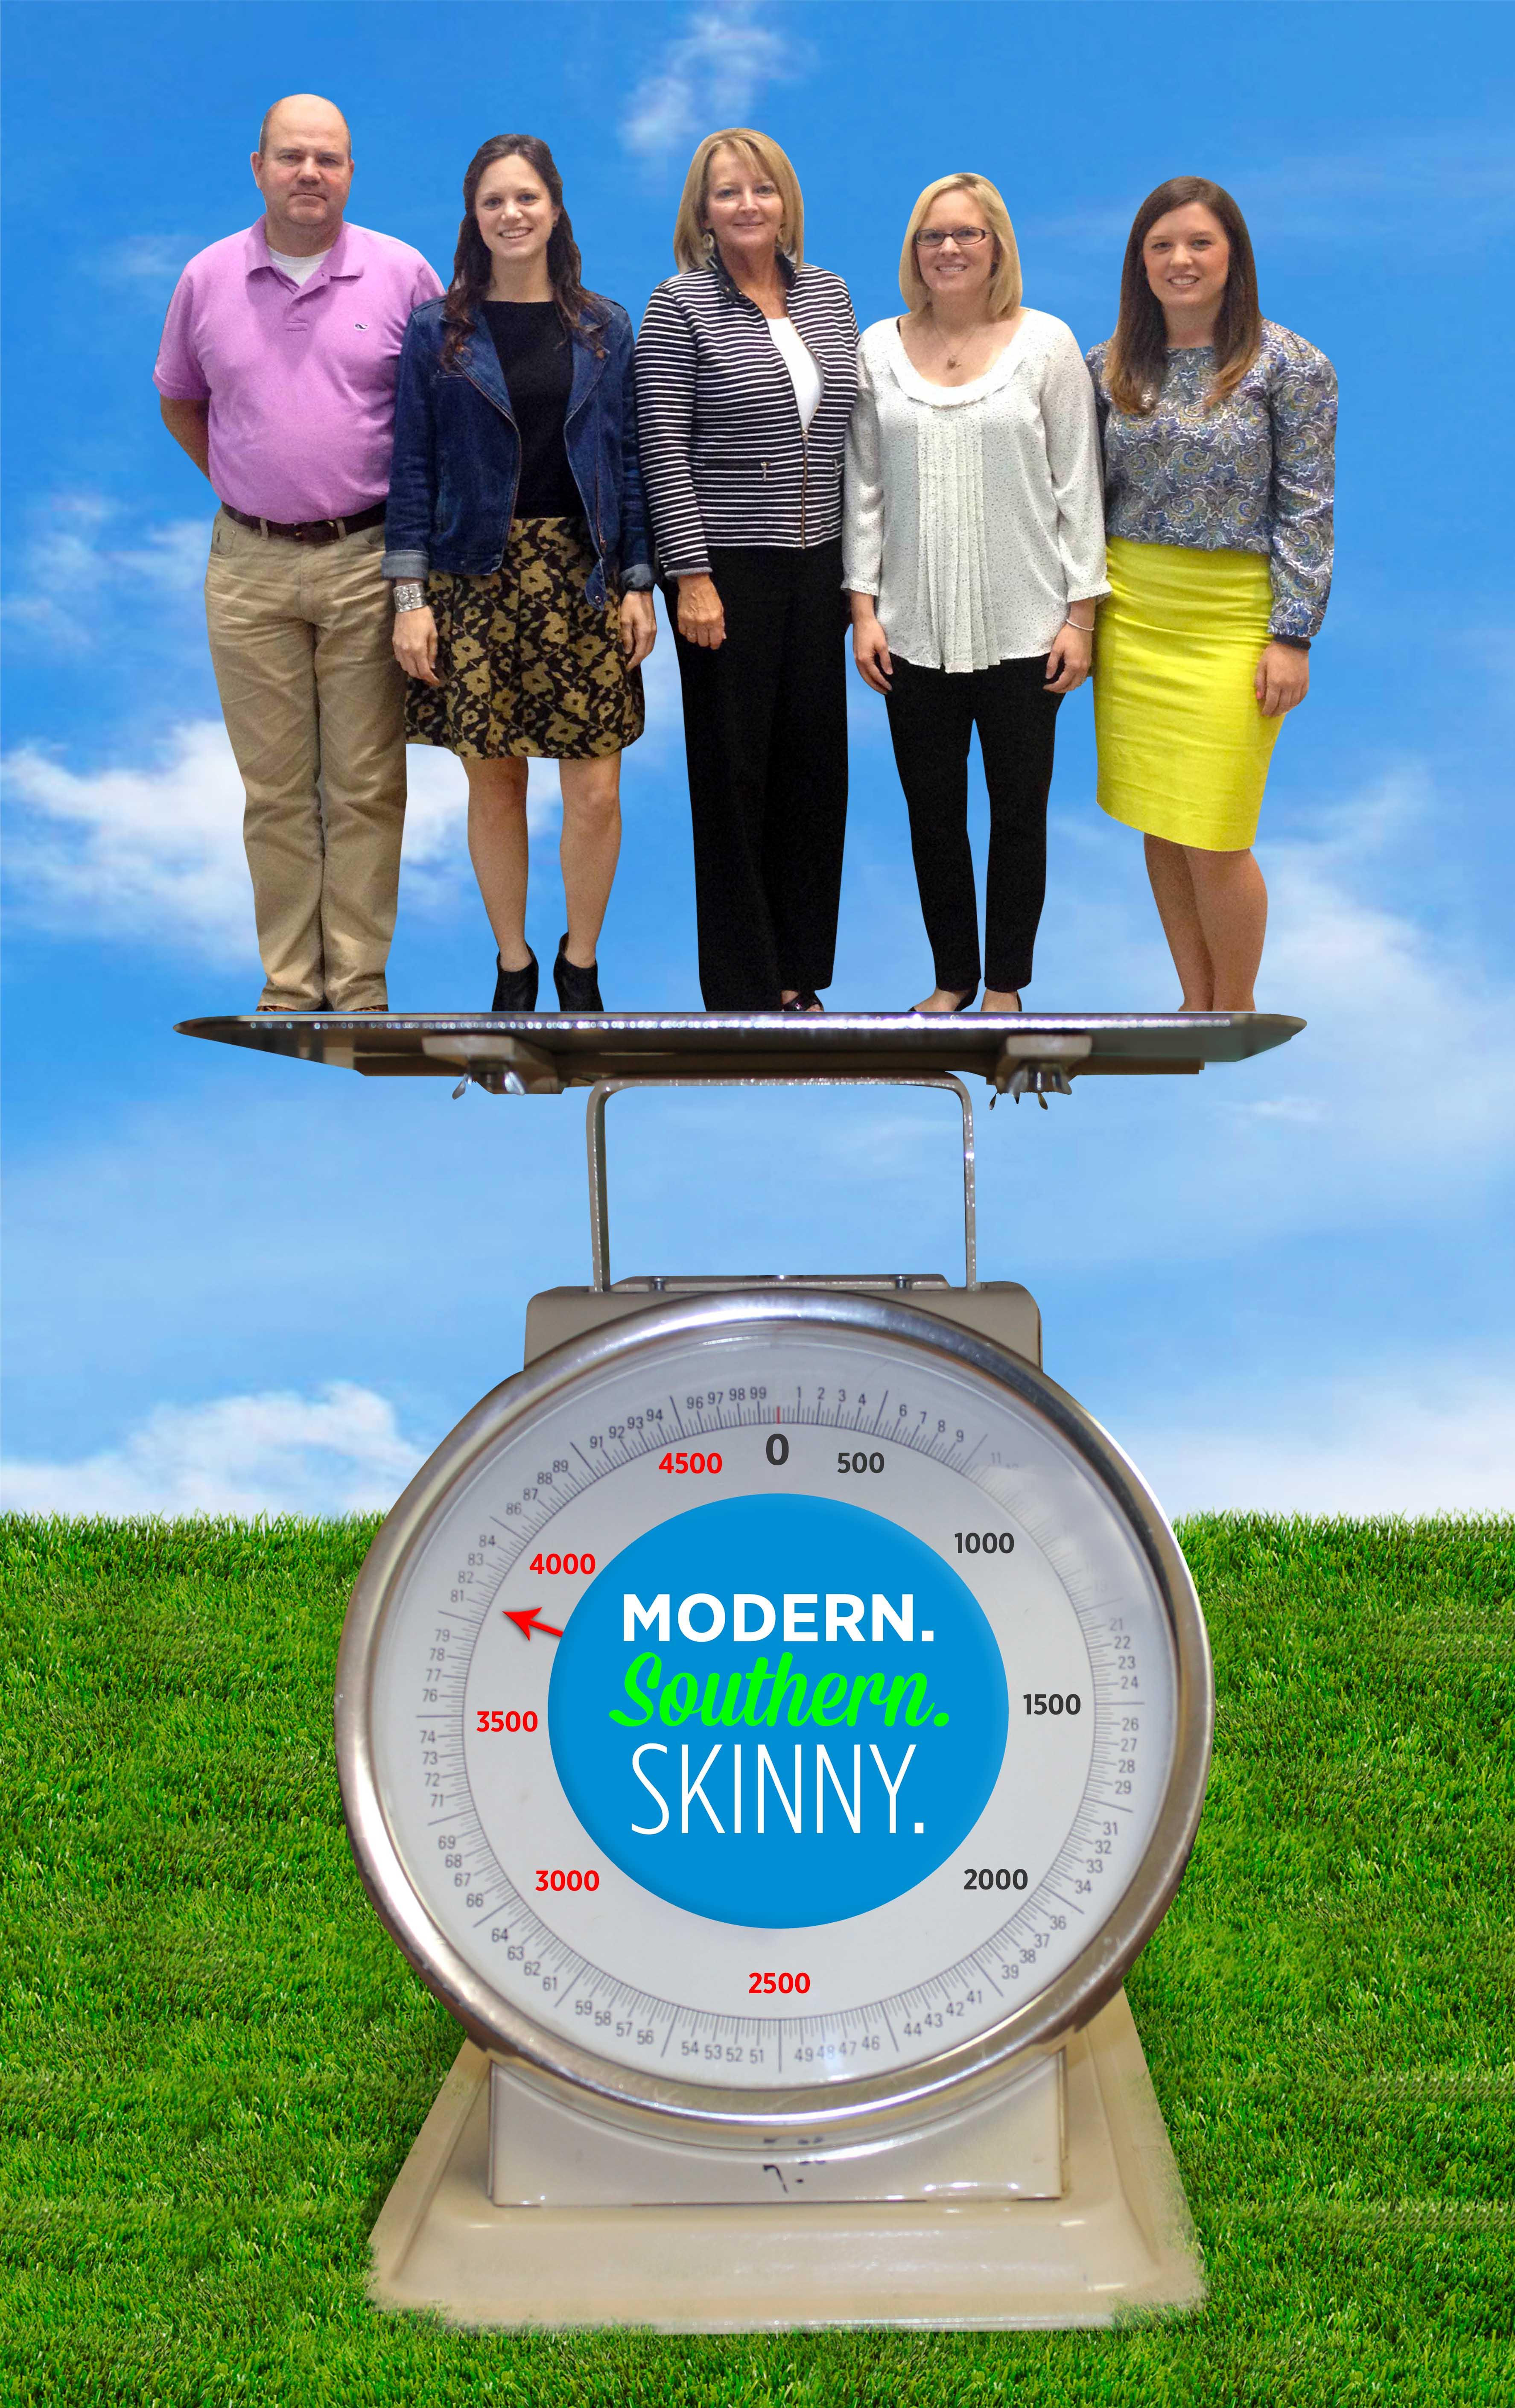 Modern. Southern. Skinny. Team Photo